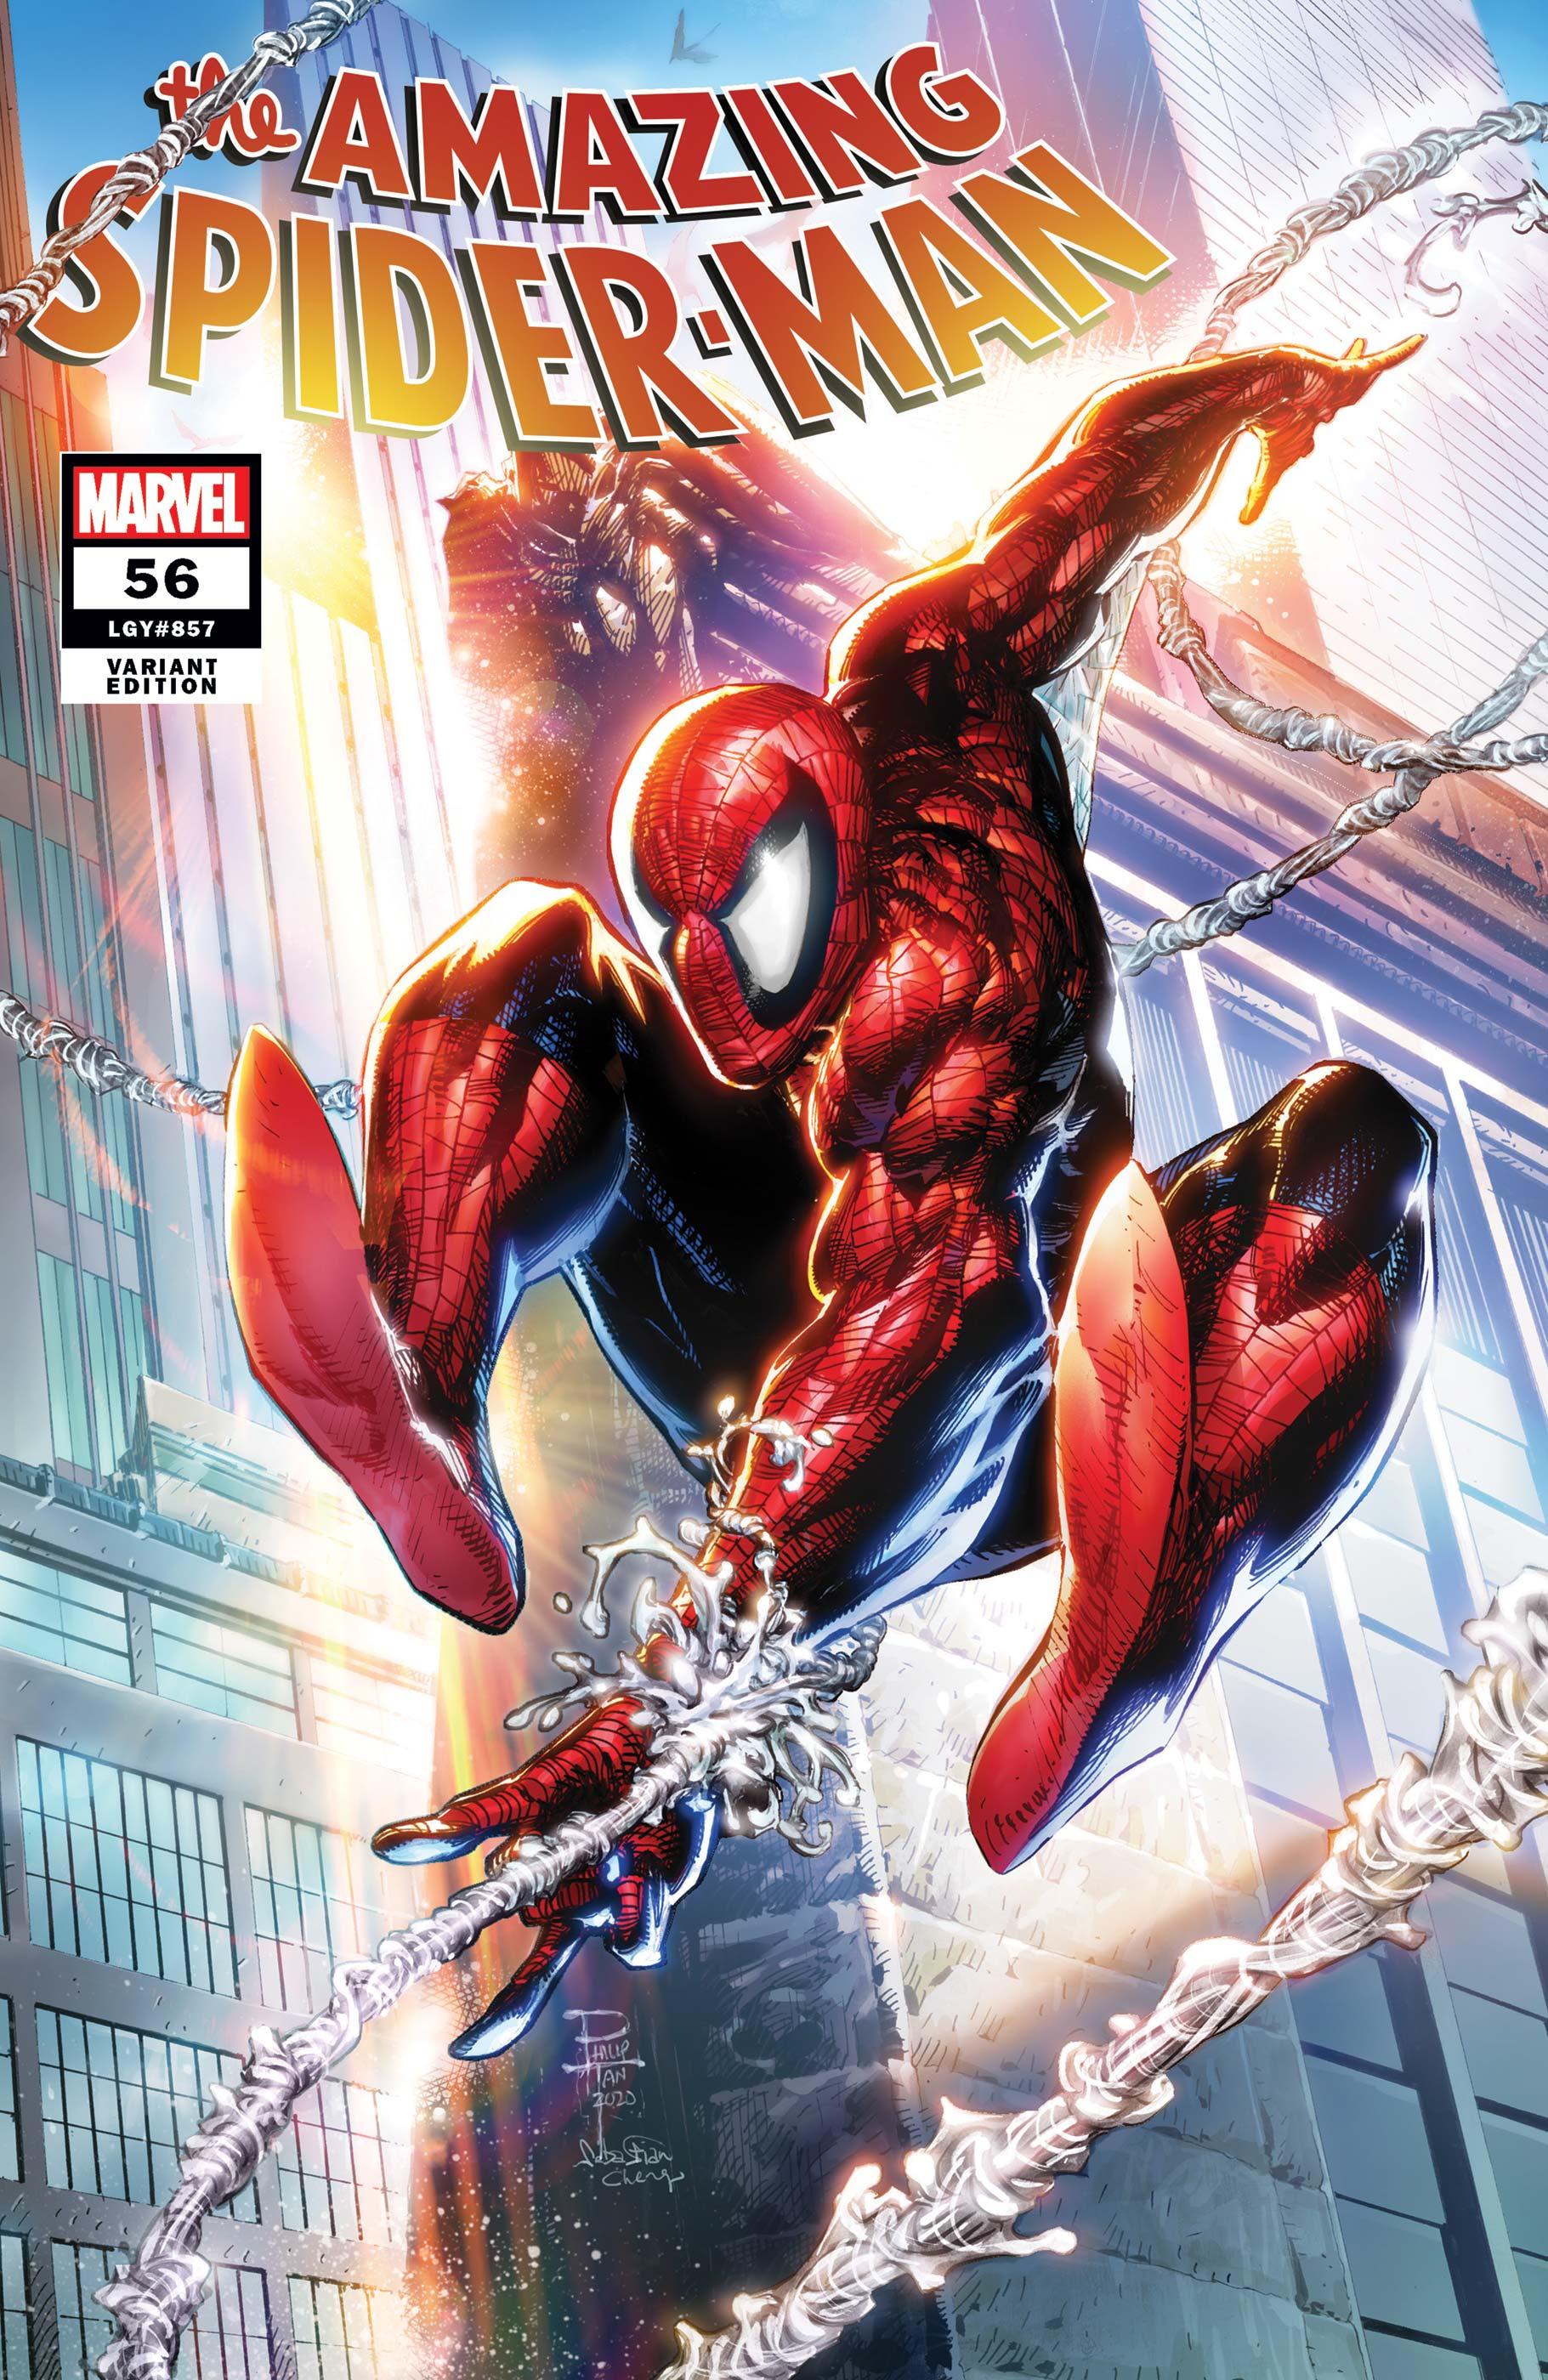 The Amazing Spider-Man (2018) #56 (Variant)